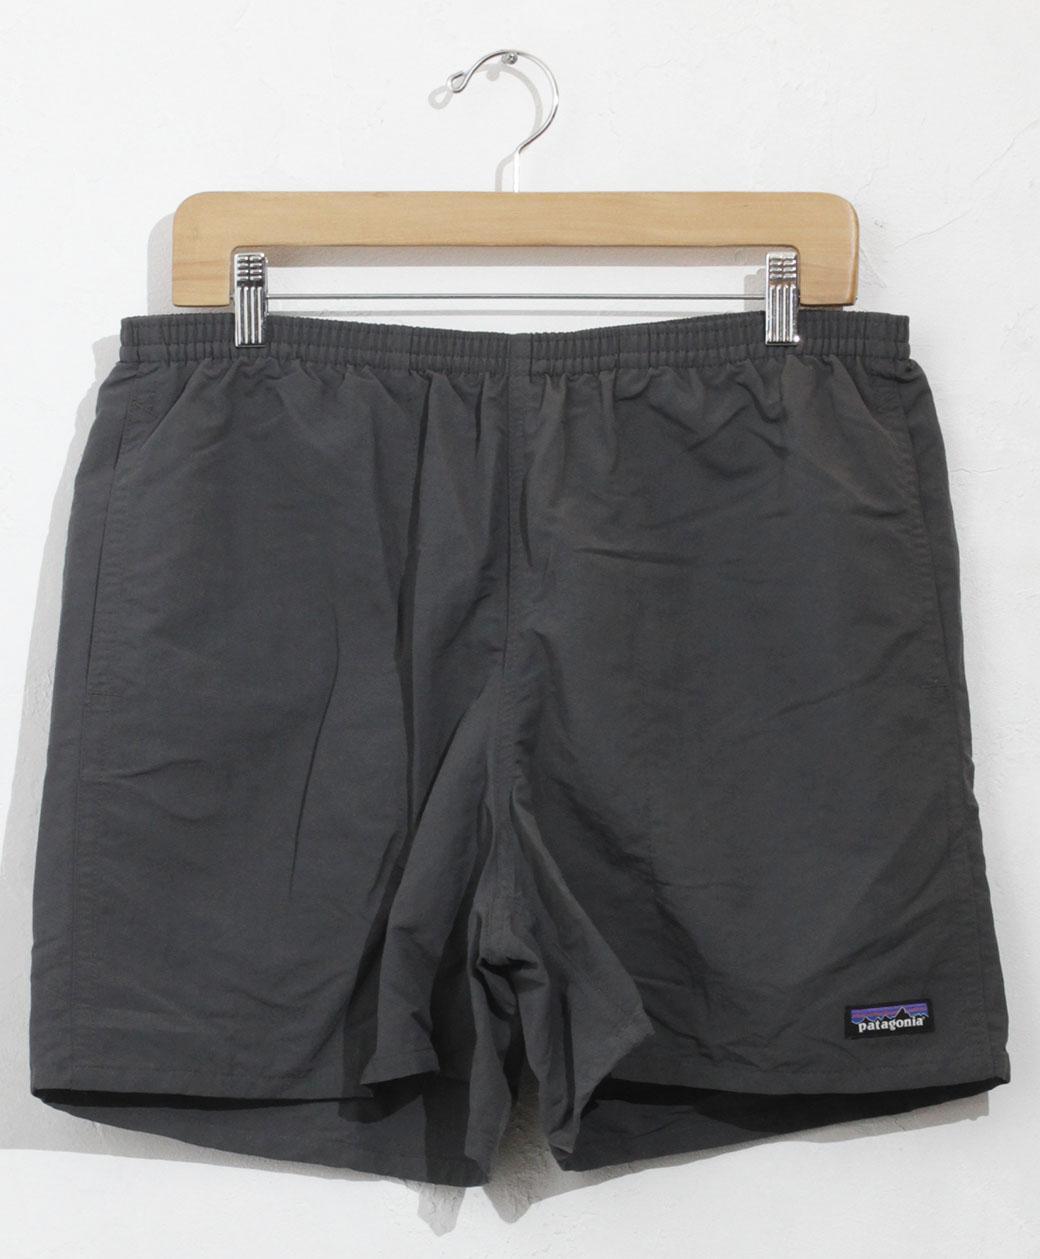 patagonia M's Baggies Shorts 5(FGE)